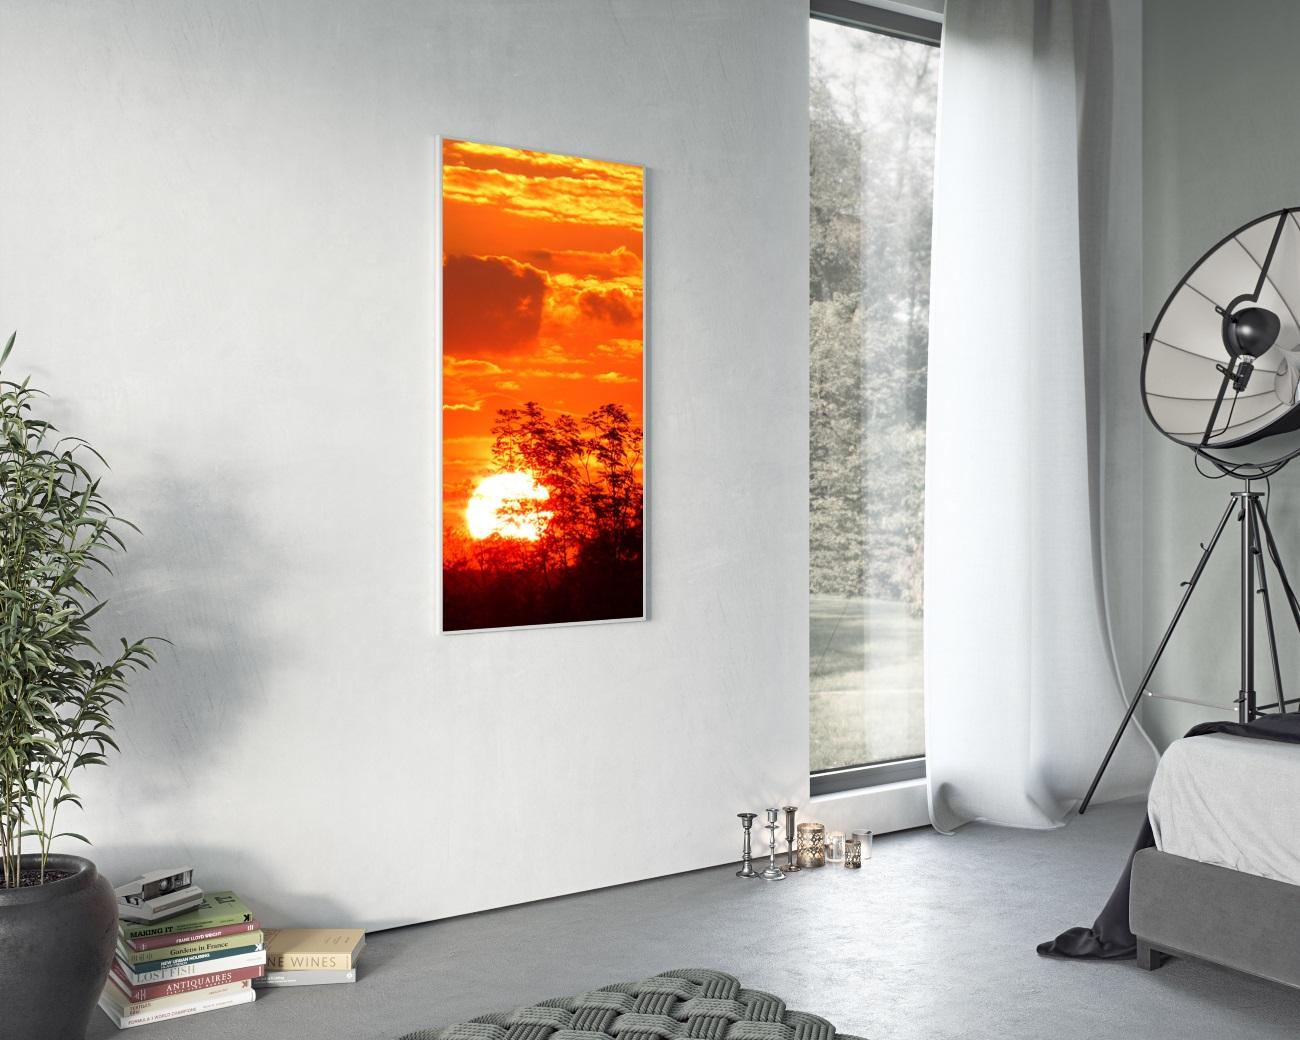 heizk rper infrarot mit bild 120 x 30 cm 400 watt bad. Black Bedroom Furniture Sets. Home Design Ideas